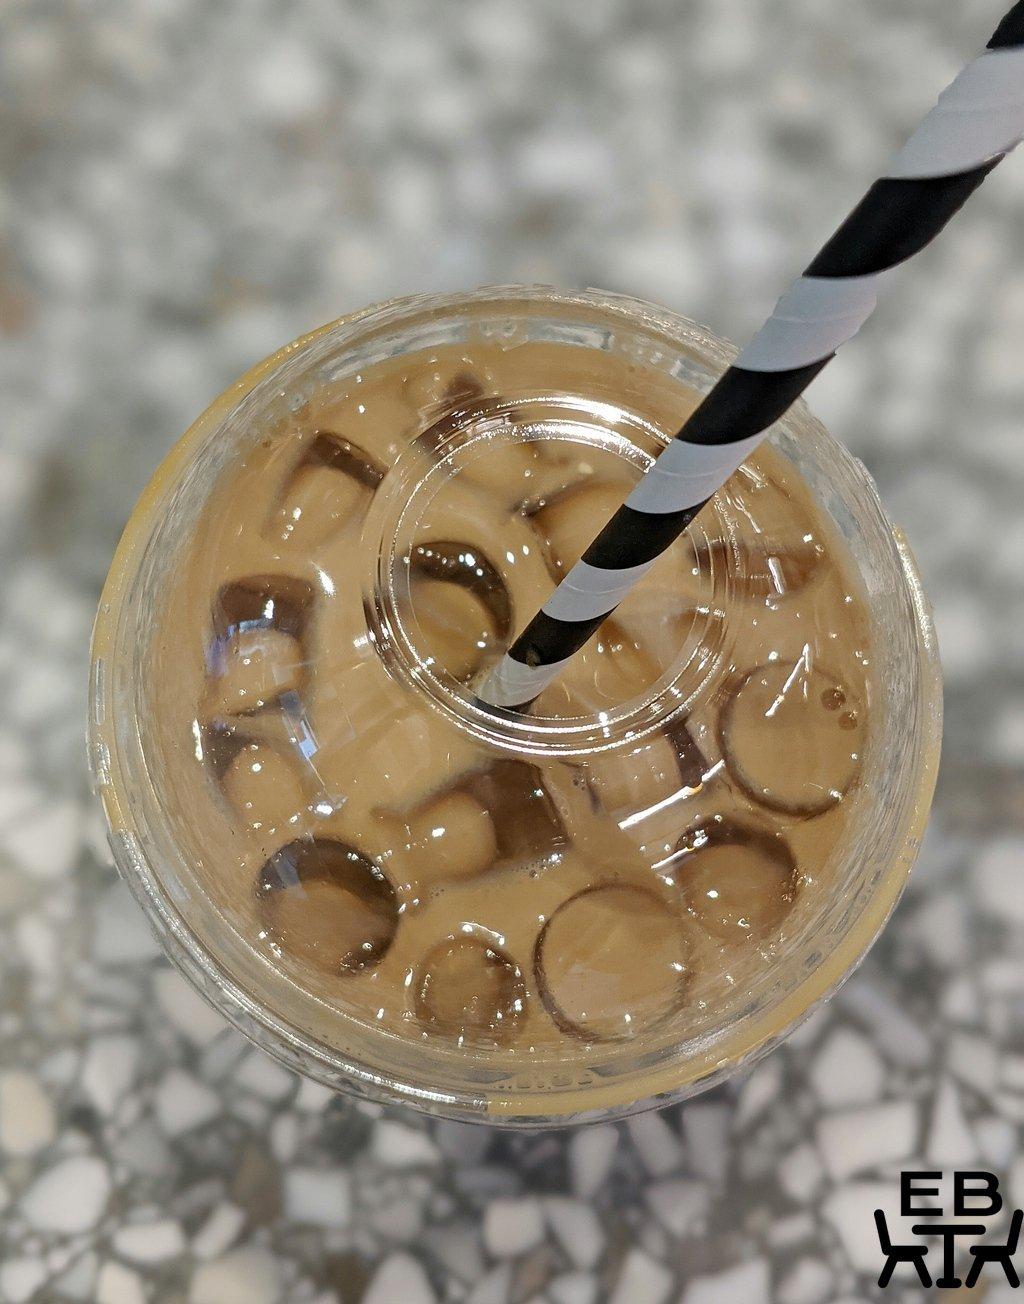 maillard project iced latte